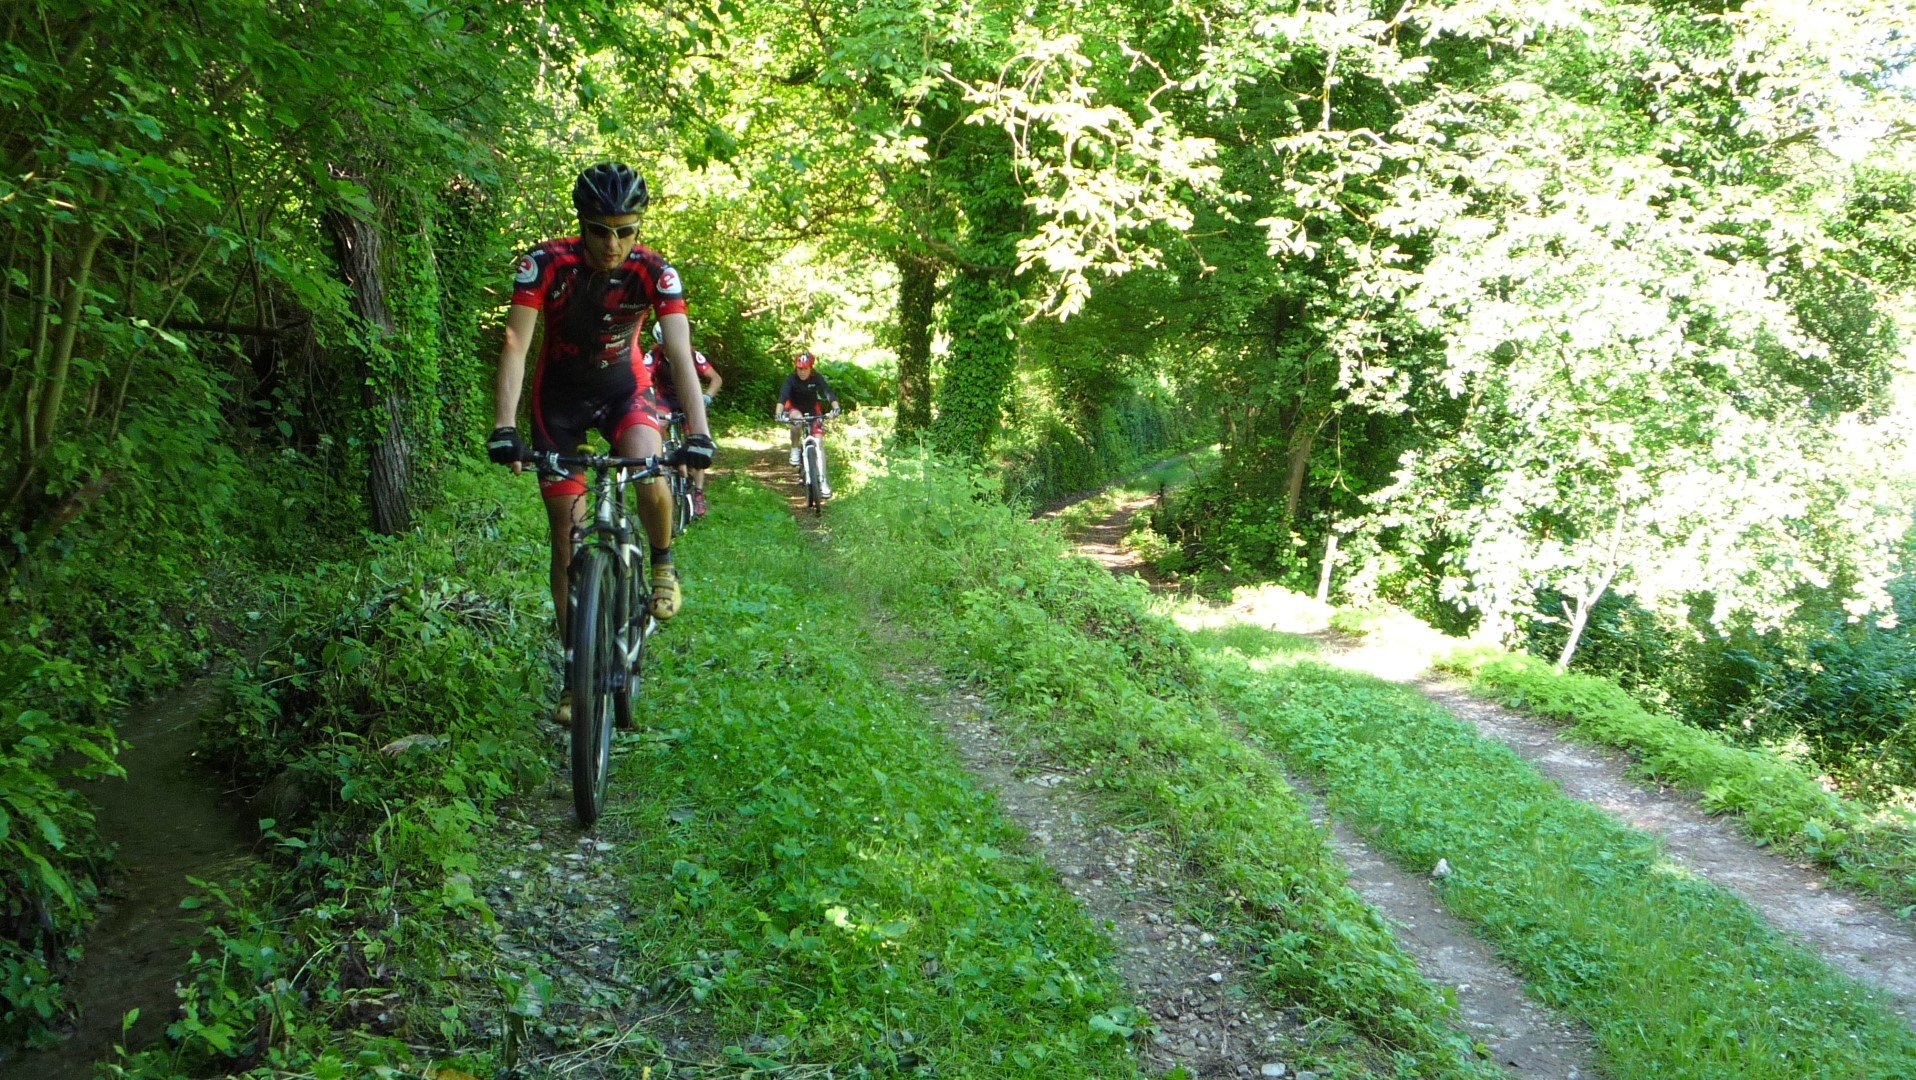 I migliori percorsi e-Bike per una vacanza in Umbria